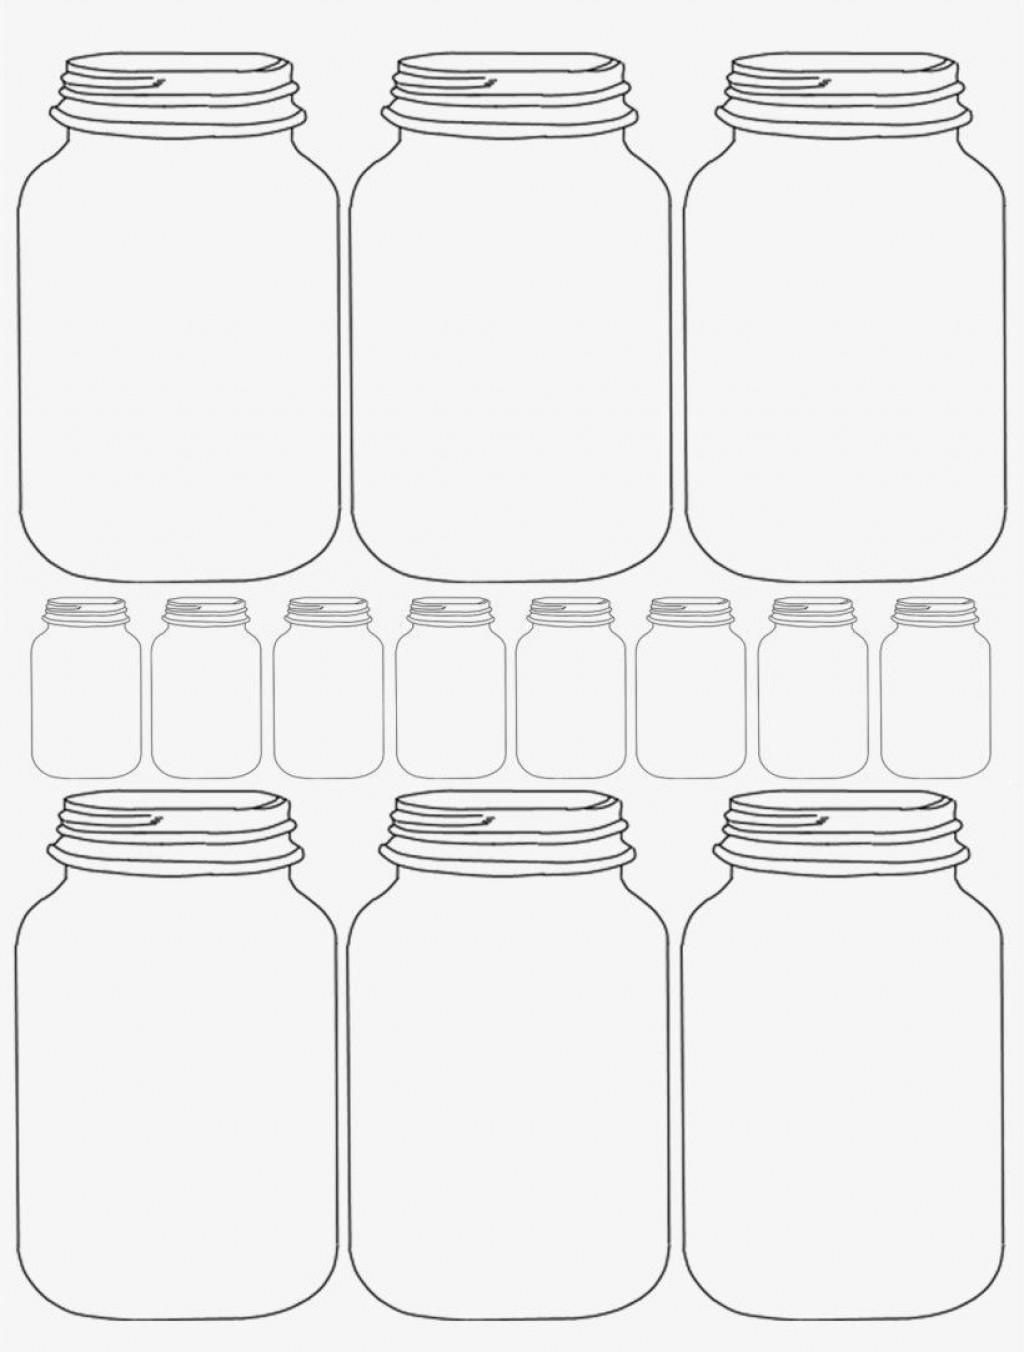 009 Striking Mason Jar Invitation Template High Def  Free Wedding Shower RusticLarge